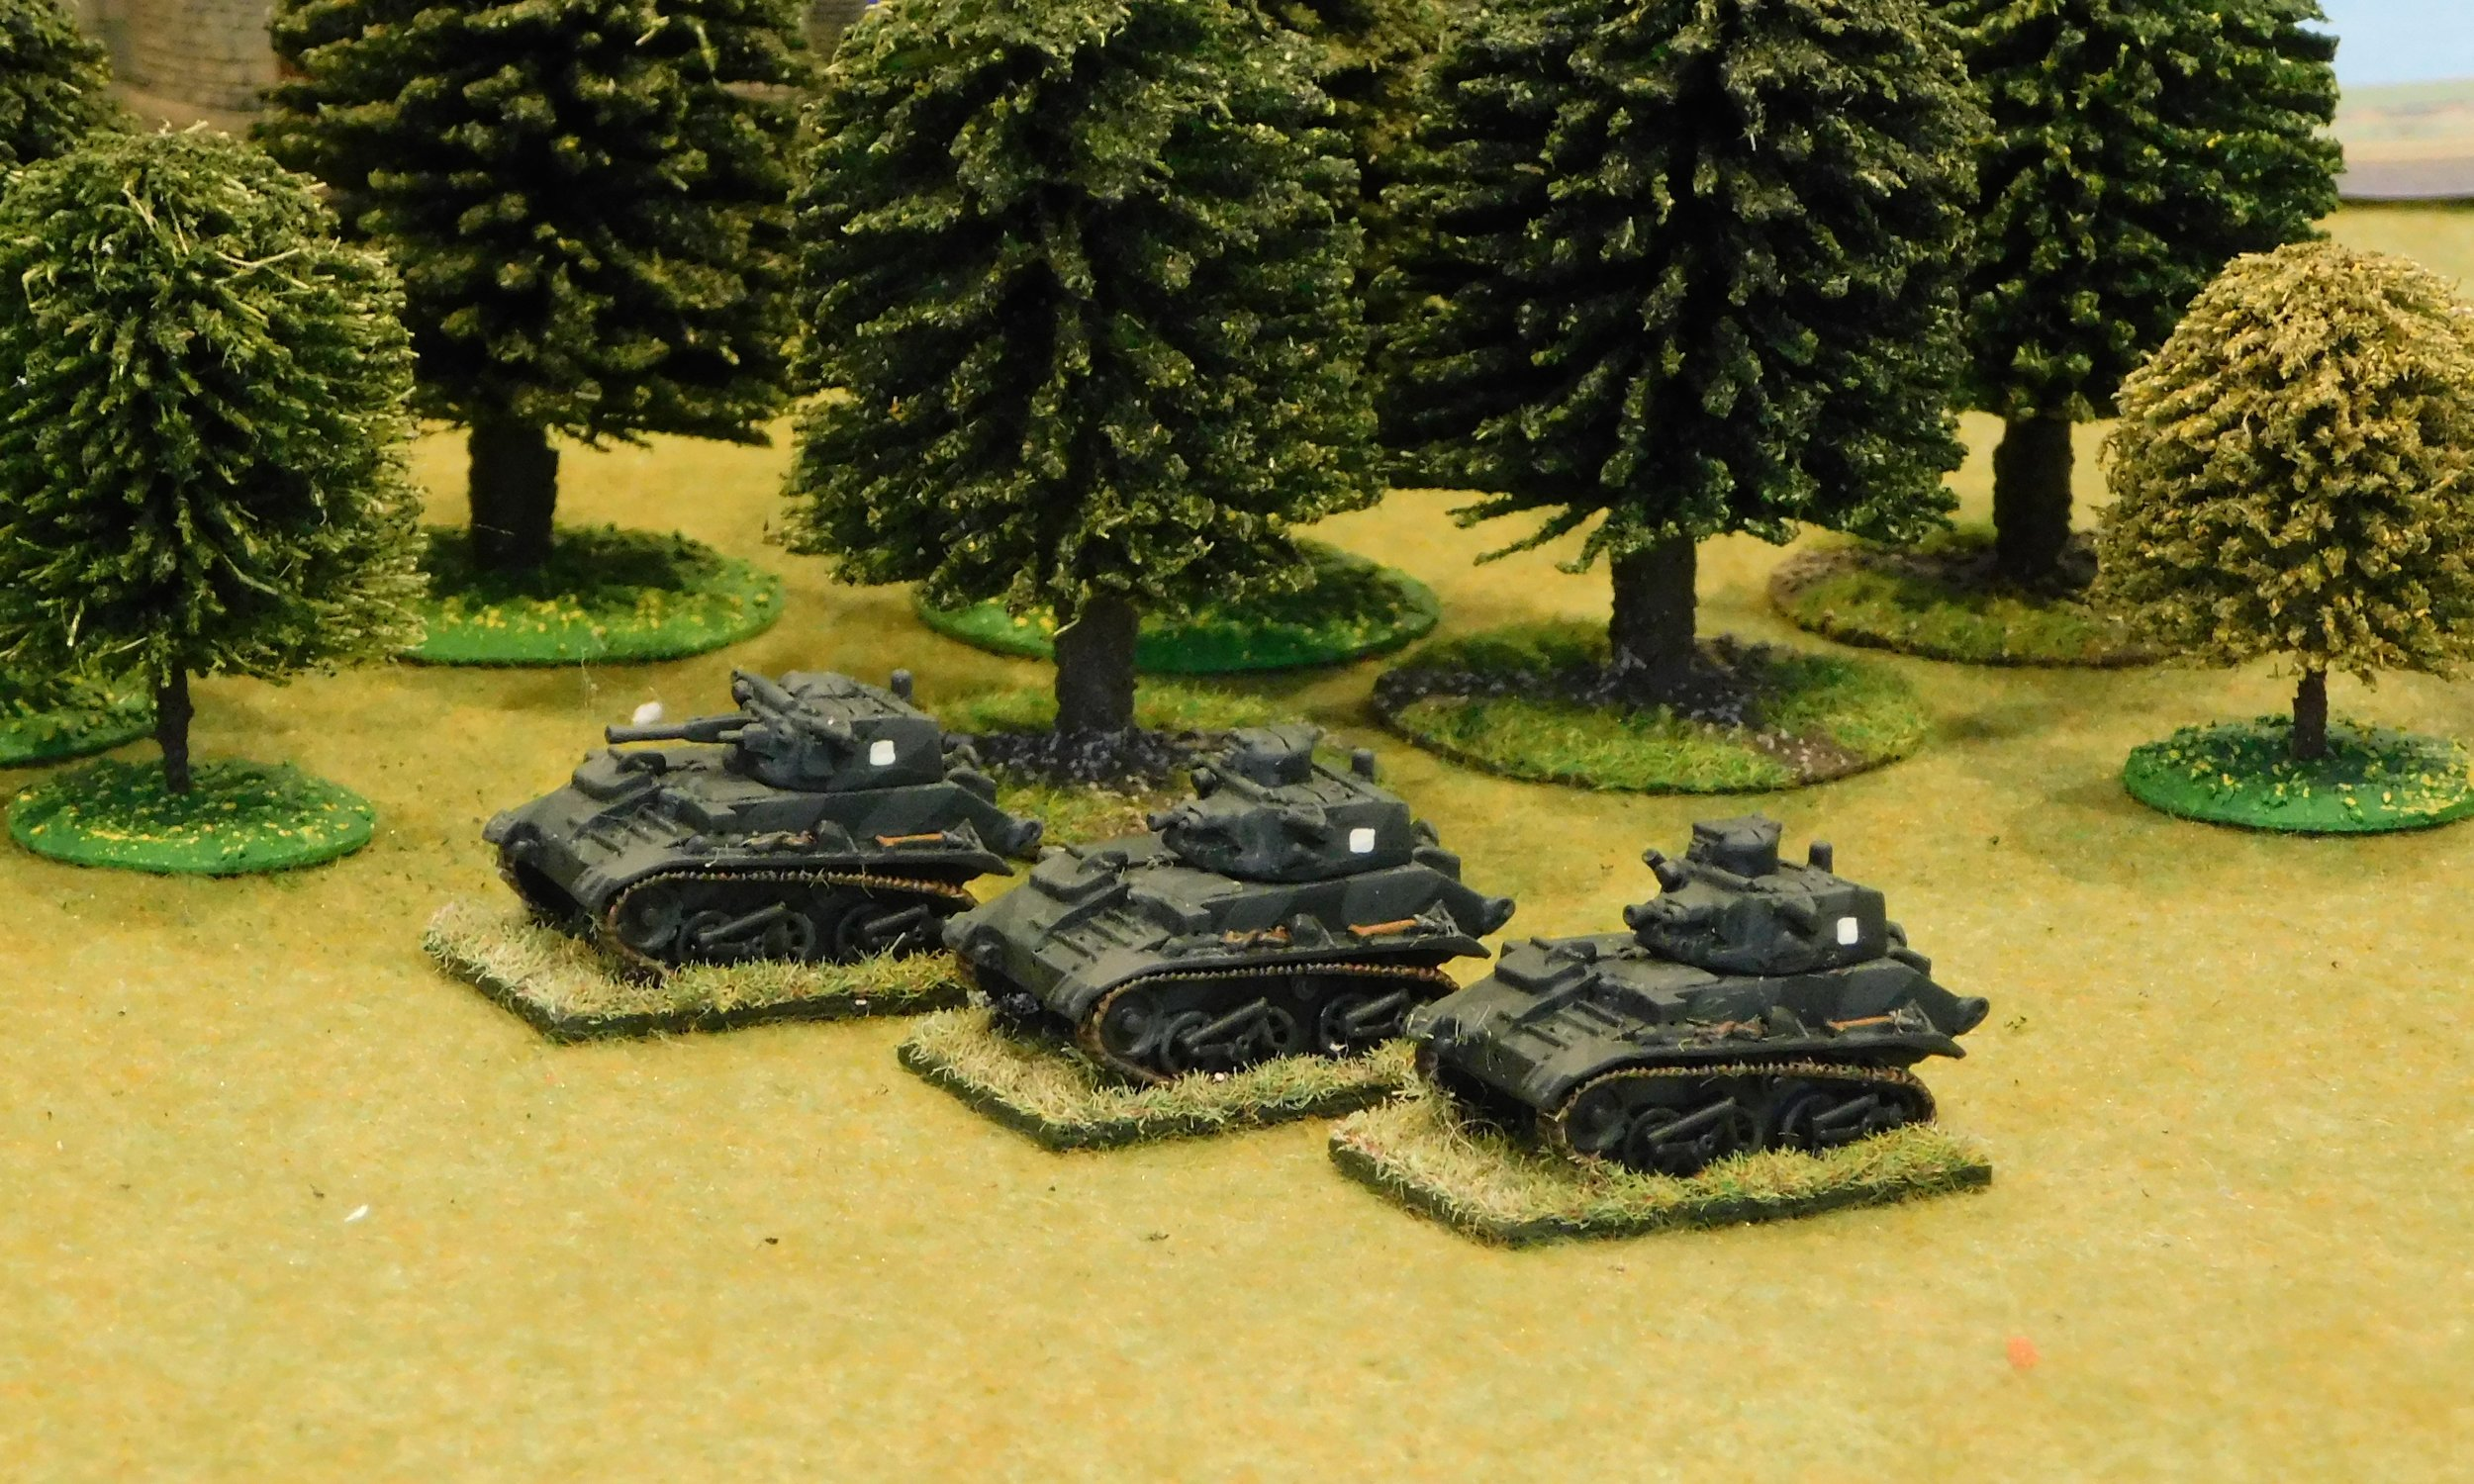 Dvisional Cavalry Troop (Vickers Mk VI B light tanks)